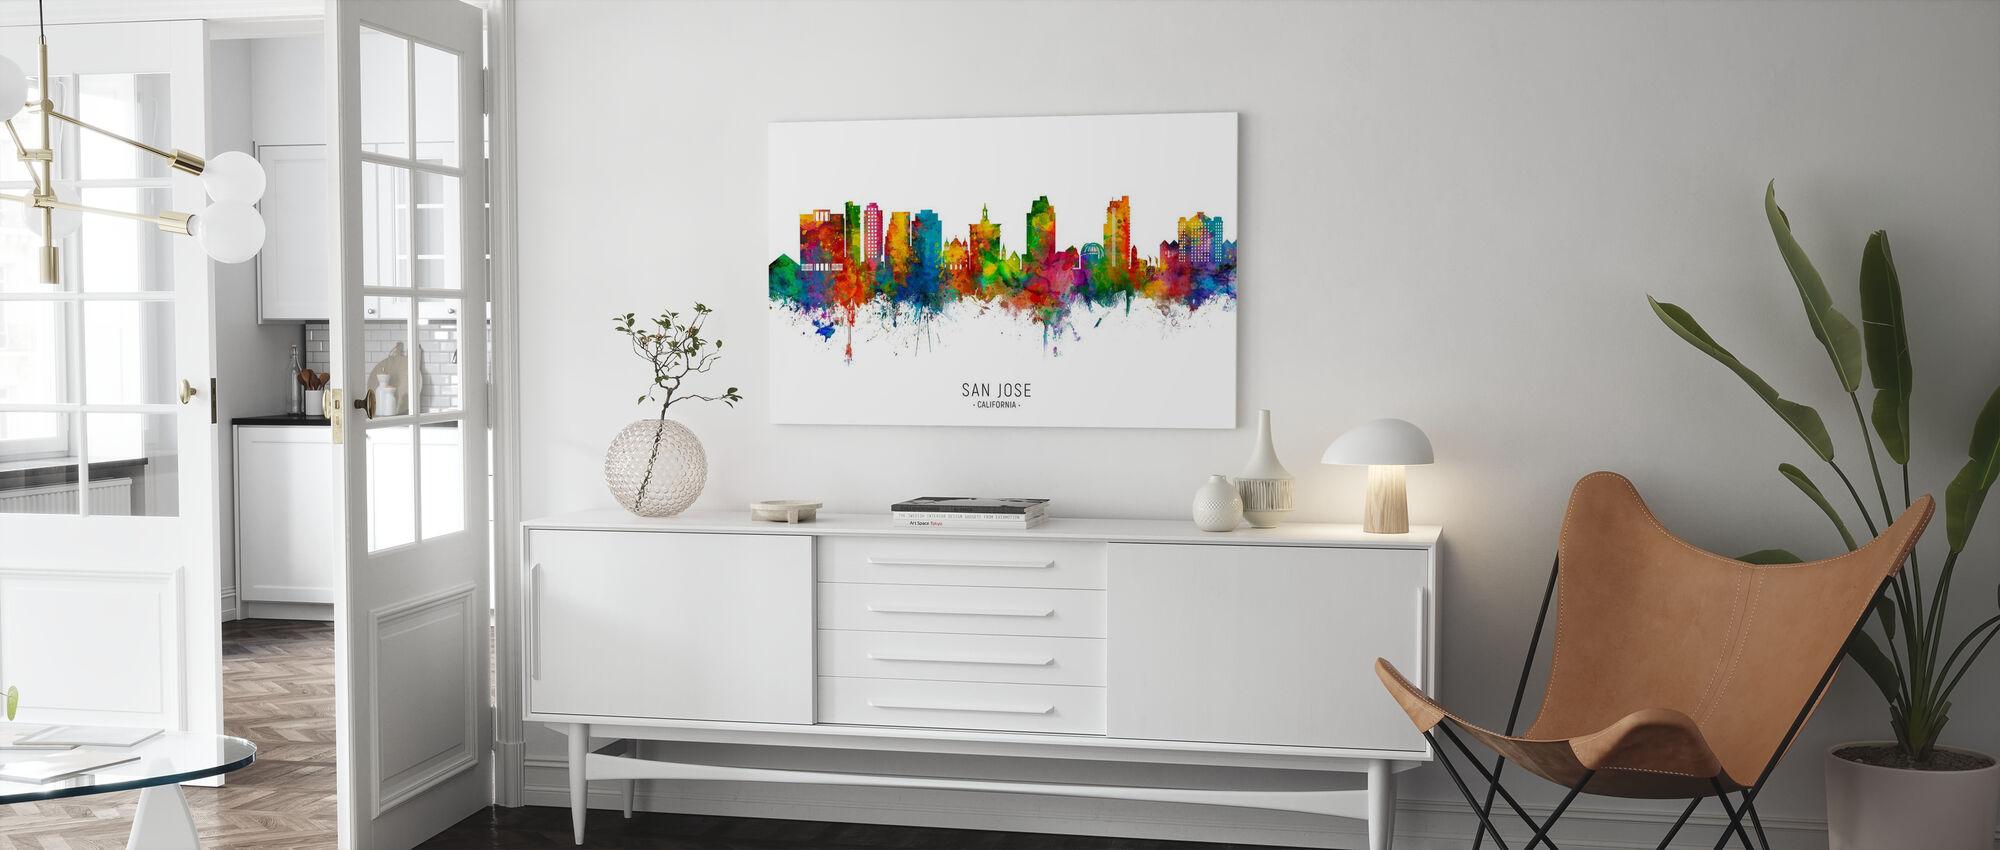 San Jose California Skyline - Canvas print - Living Room